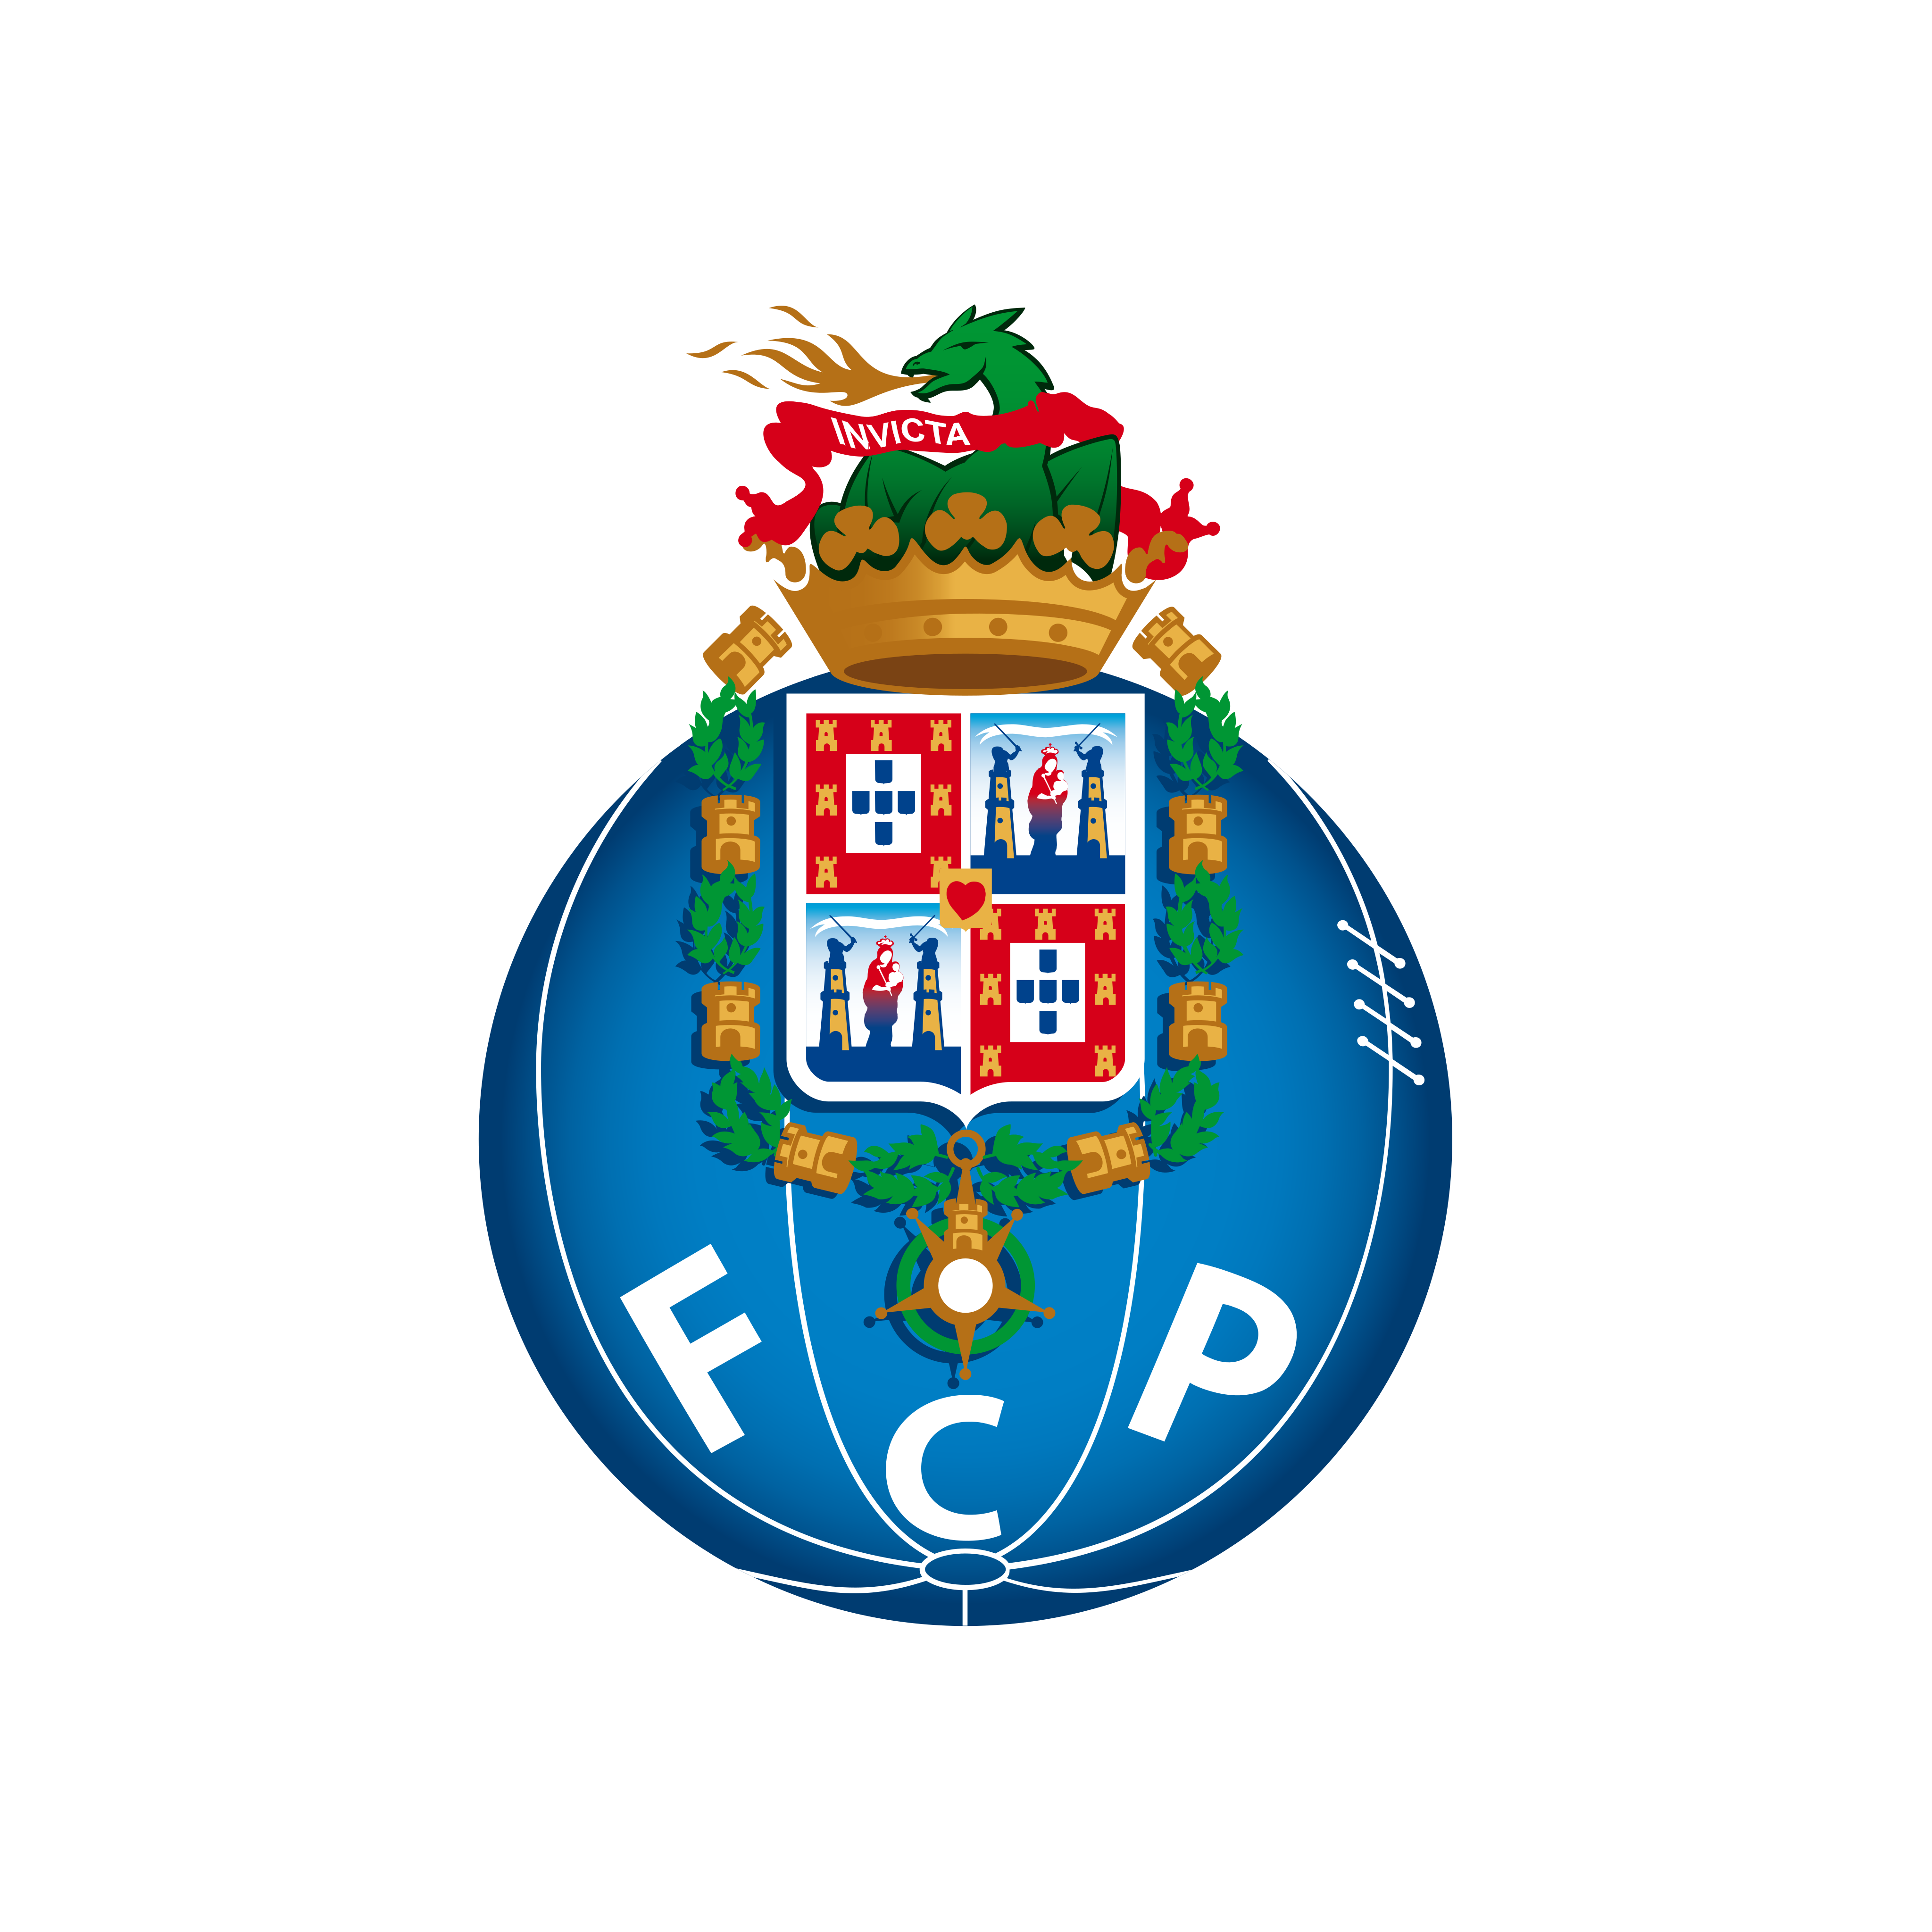 fc porto logo 0 - FC Porto Logo